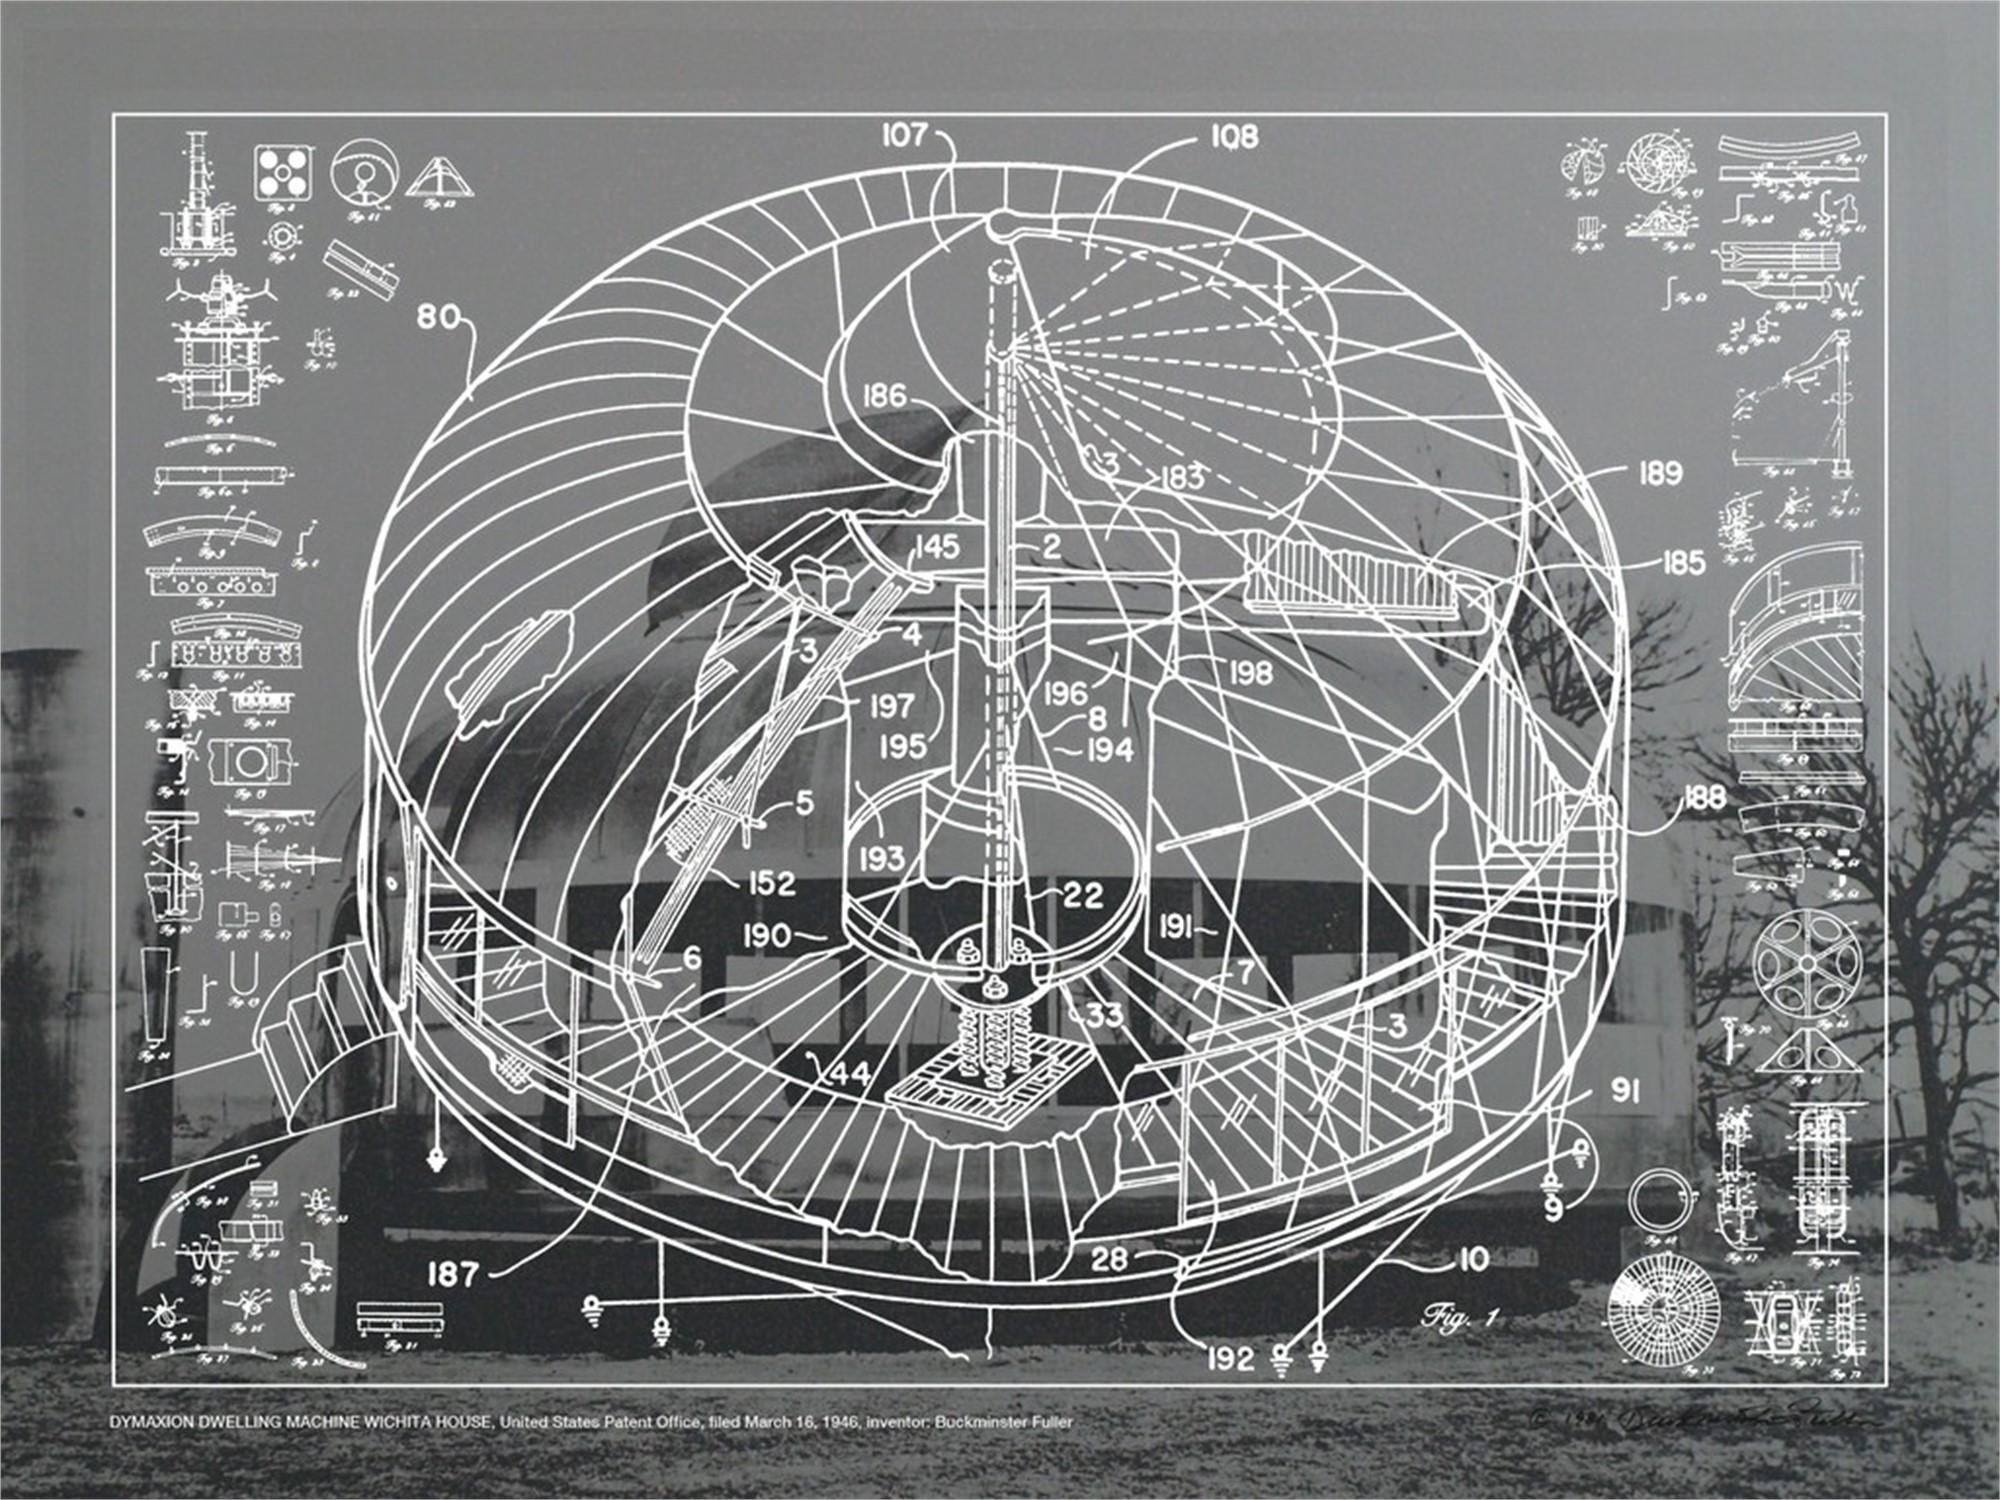 Dymaxion Dwelling Machine-Wichita House by Buckminster Fuller